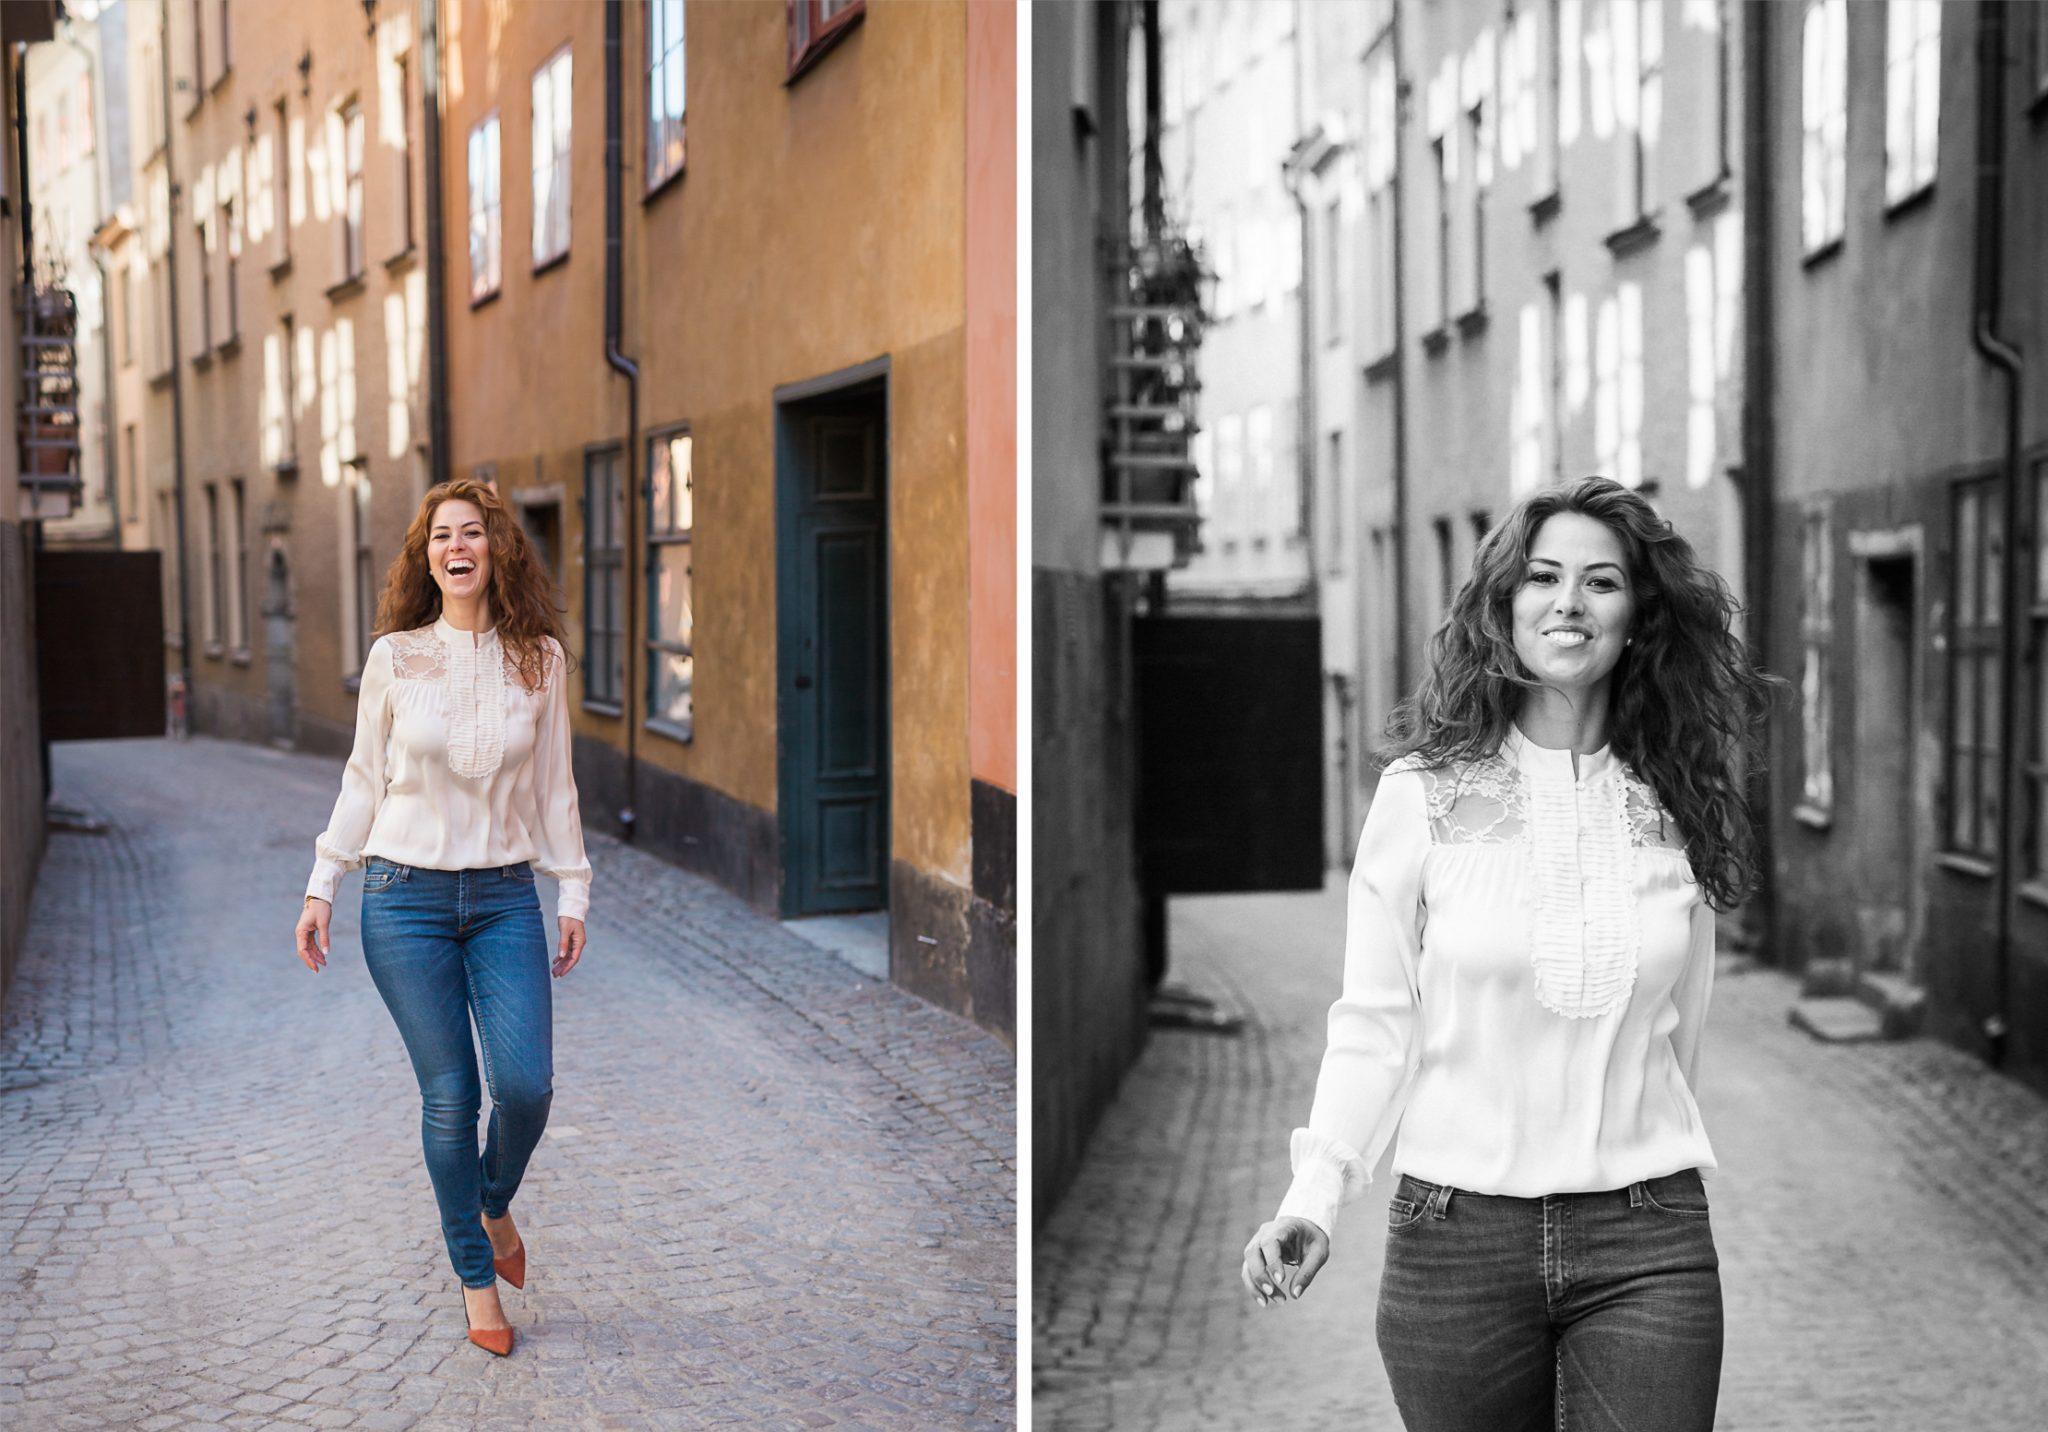 Brand-portrait-Stockholm8